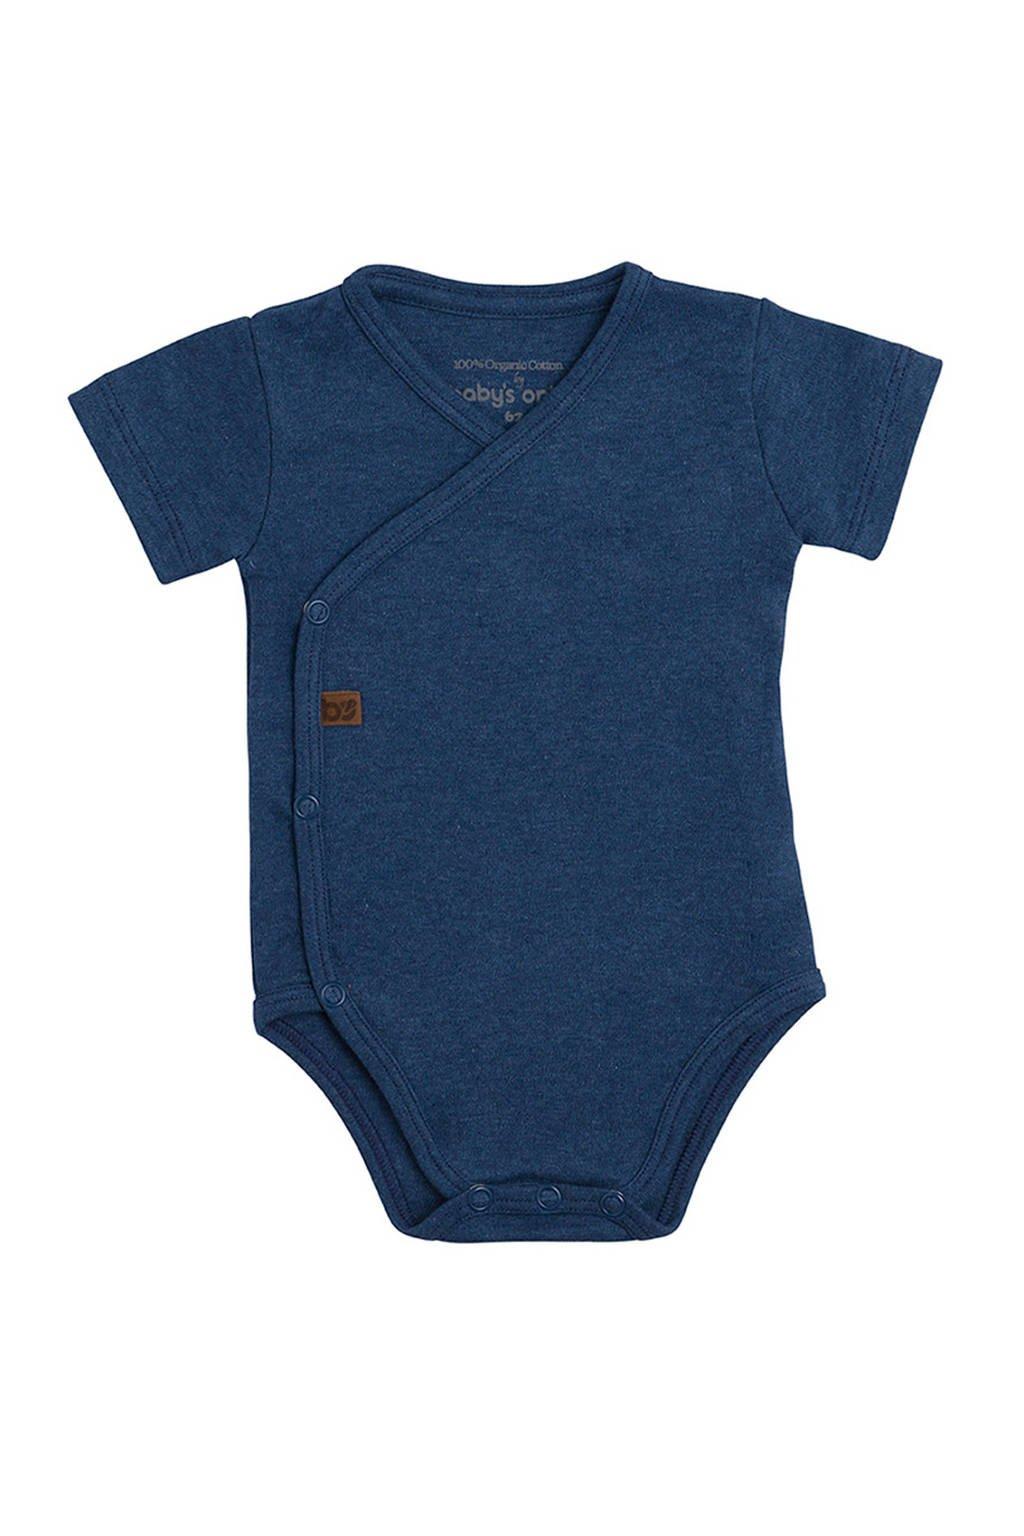 Baby's Only newborn baby romper, Donkerblauw